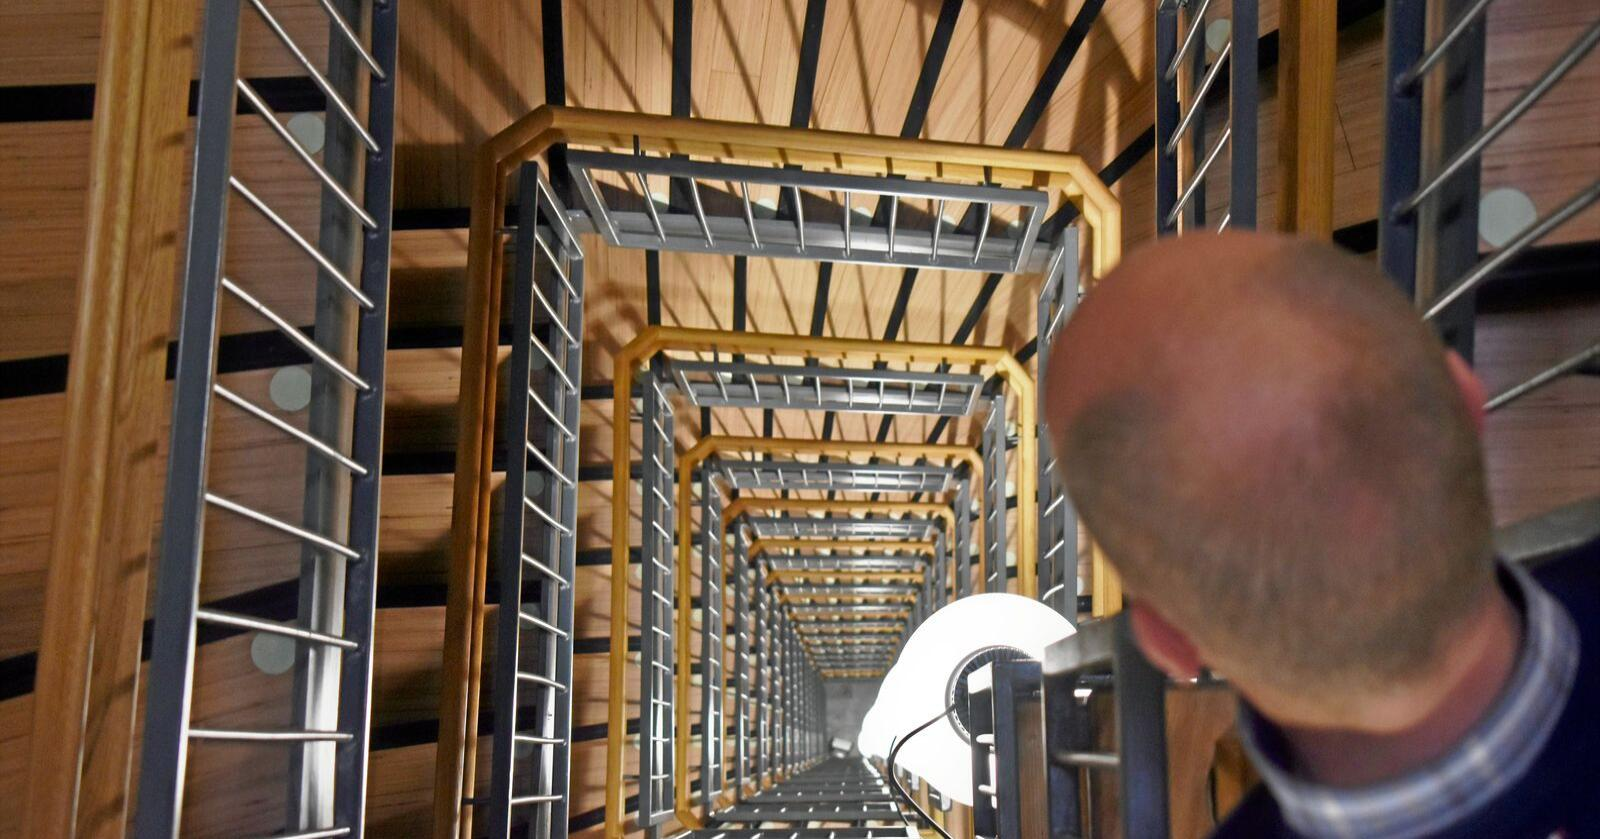 Verdens høyeste: Sp-leder Trygve Slagsvold Vedum i trappegangen i Mjøstårnet i Brumunddal. Foto: Henrik Heldahl.